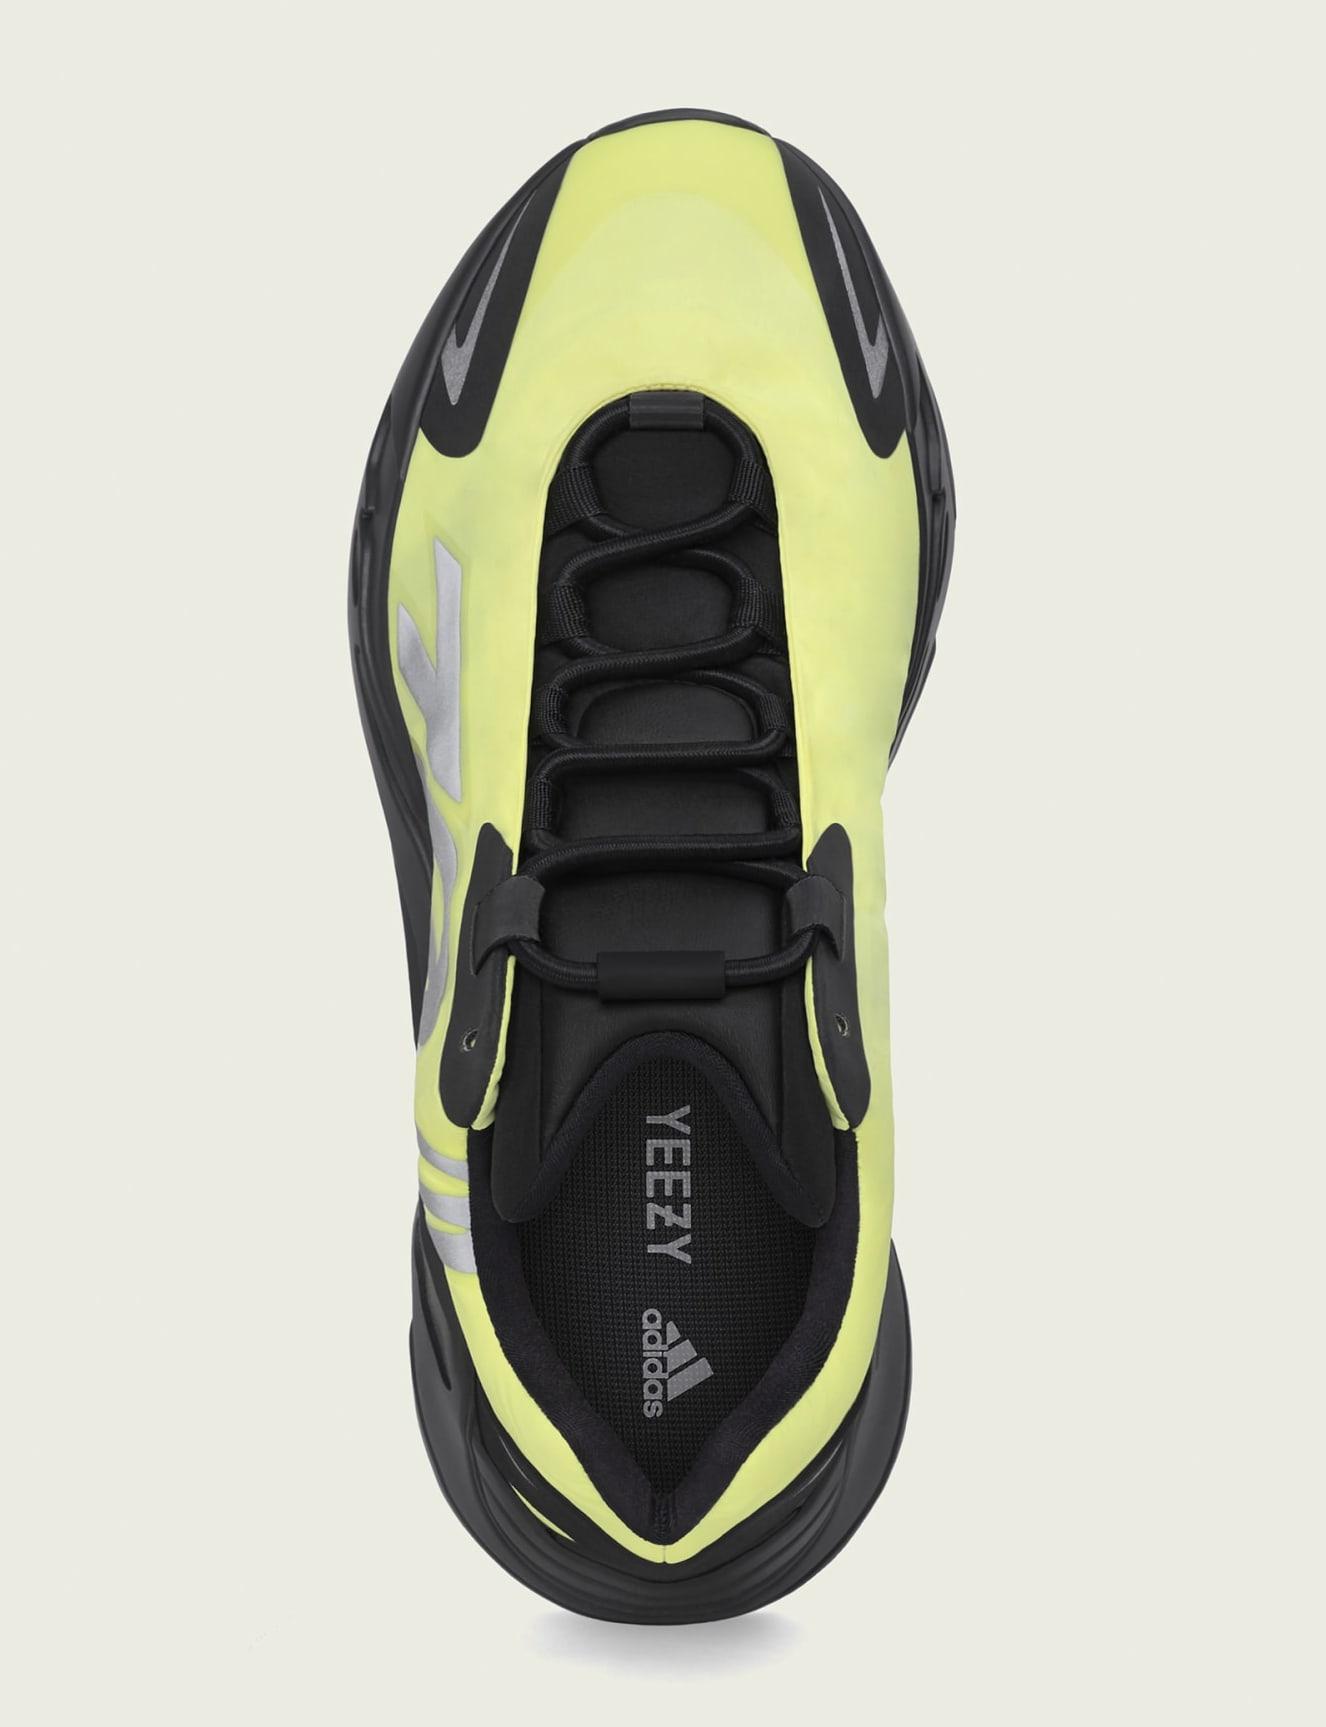 Adidas Yeezy Boost 700 MNVN 'Phosphor' FY3727 Top